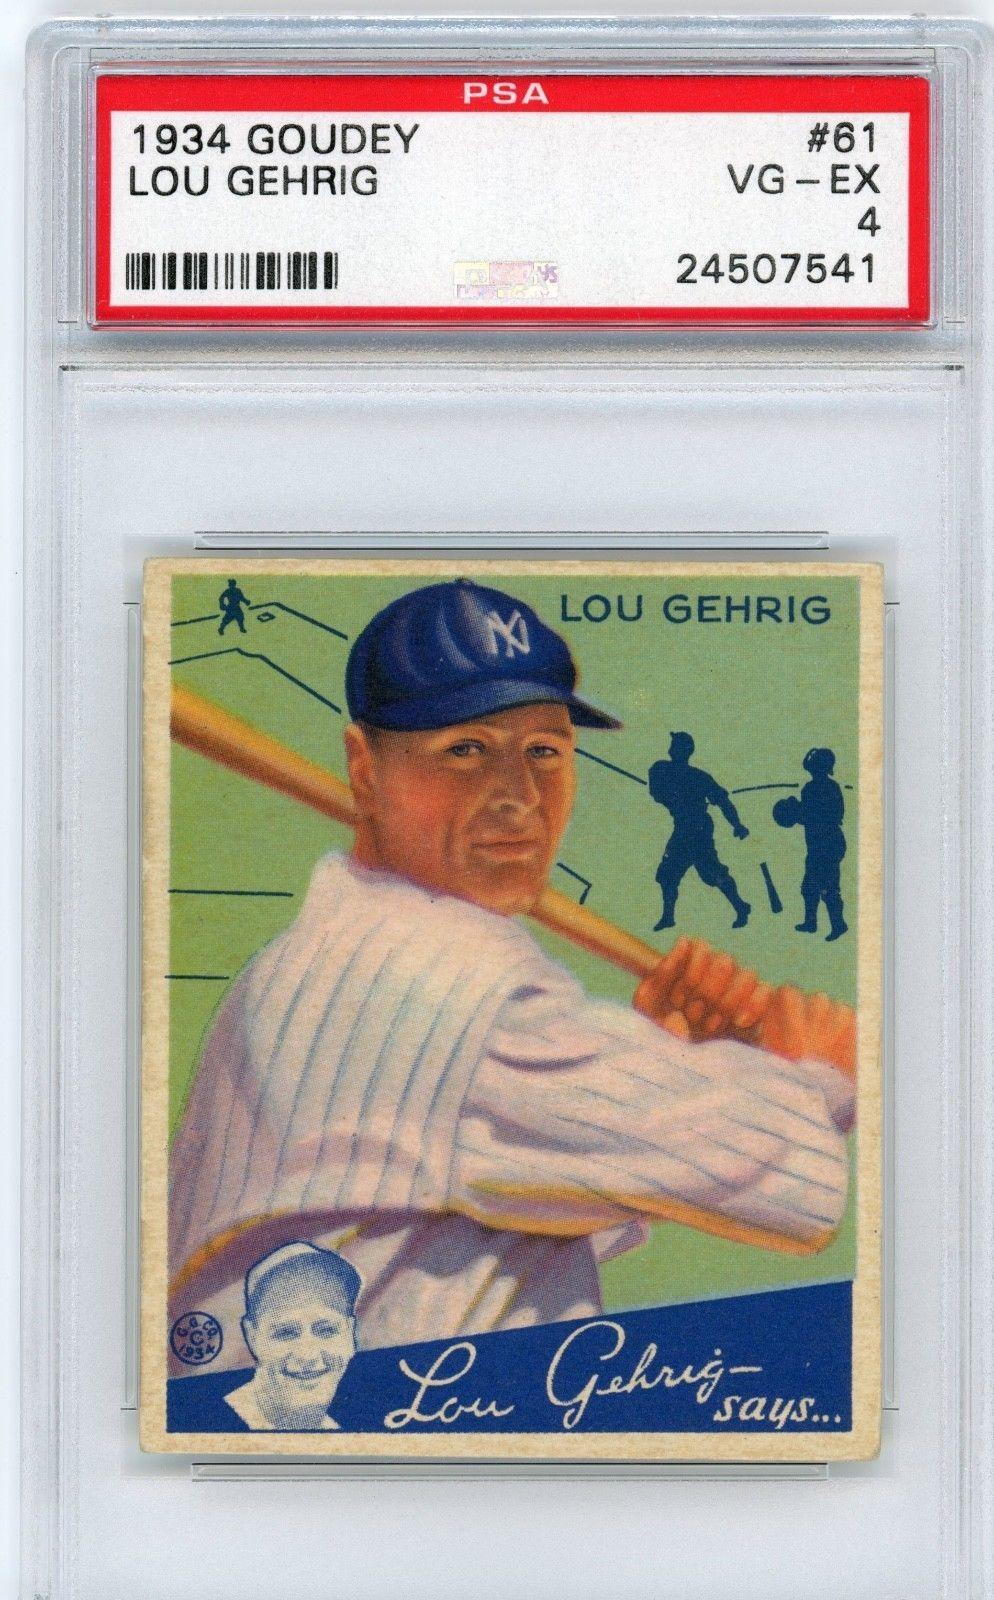 1934 Goudey Gum Baseball Card 61 Lou Gehrig Psa Graded 4